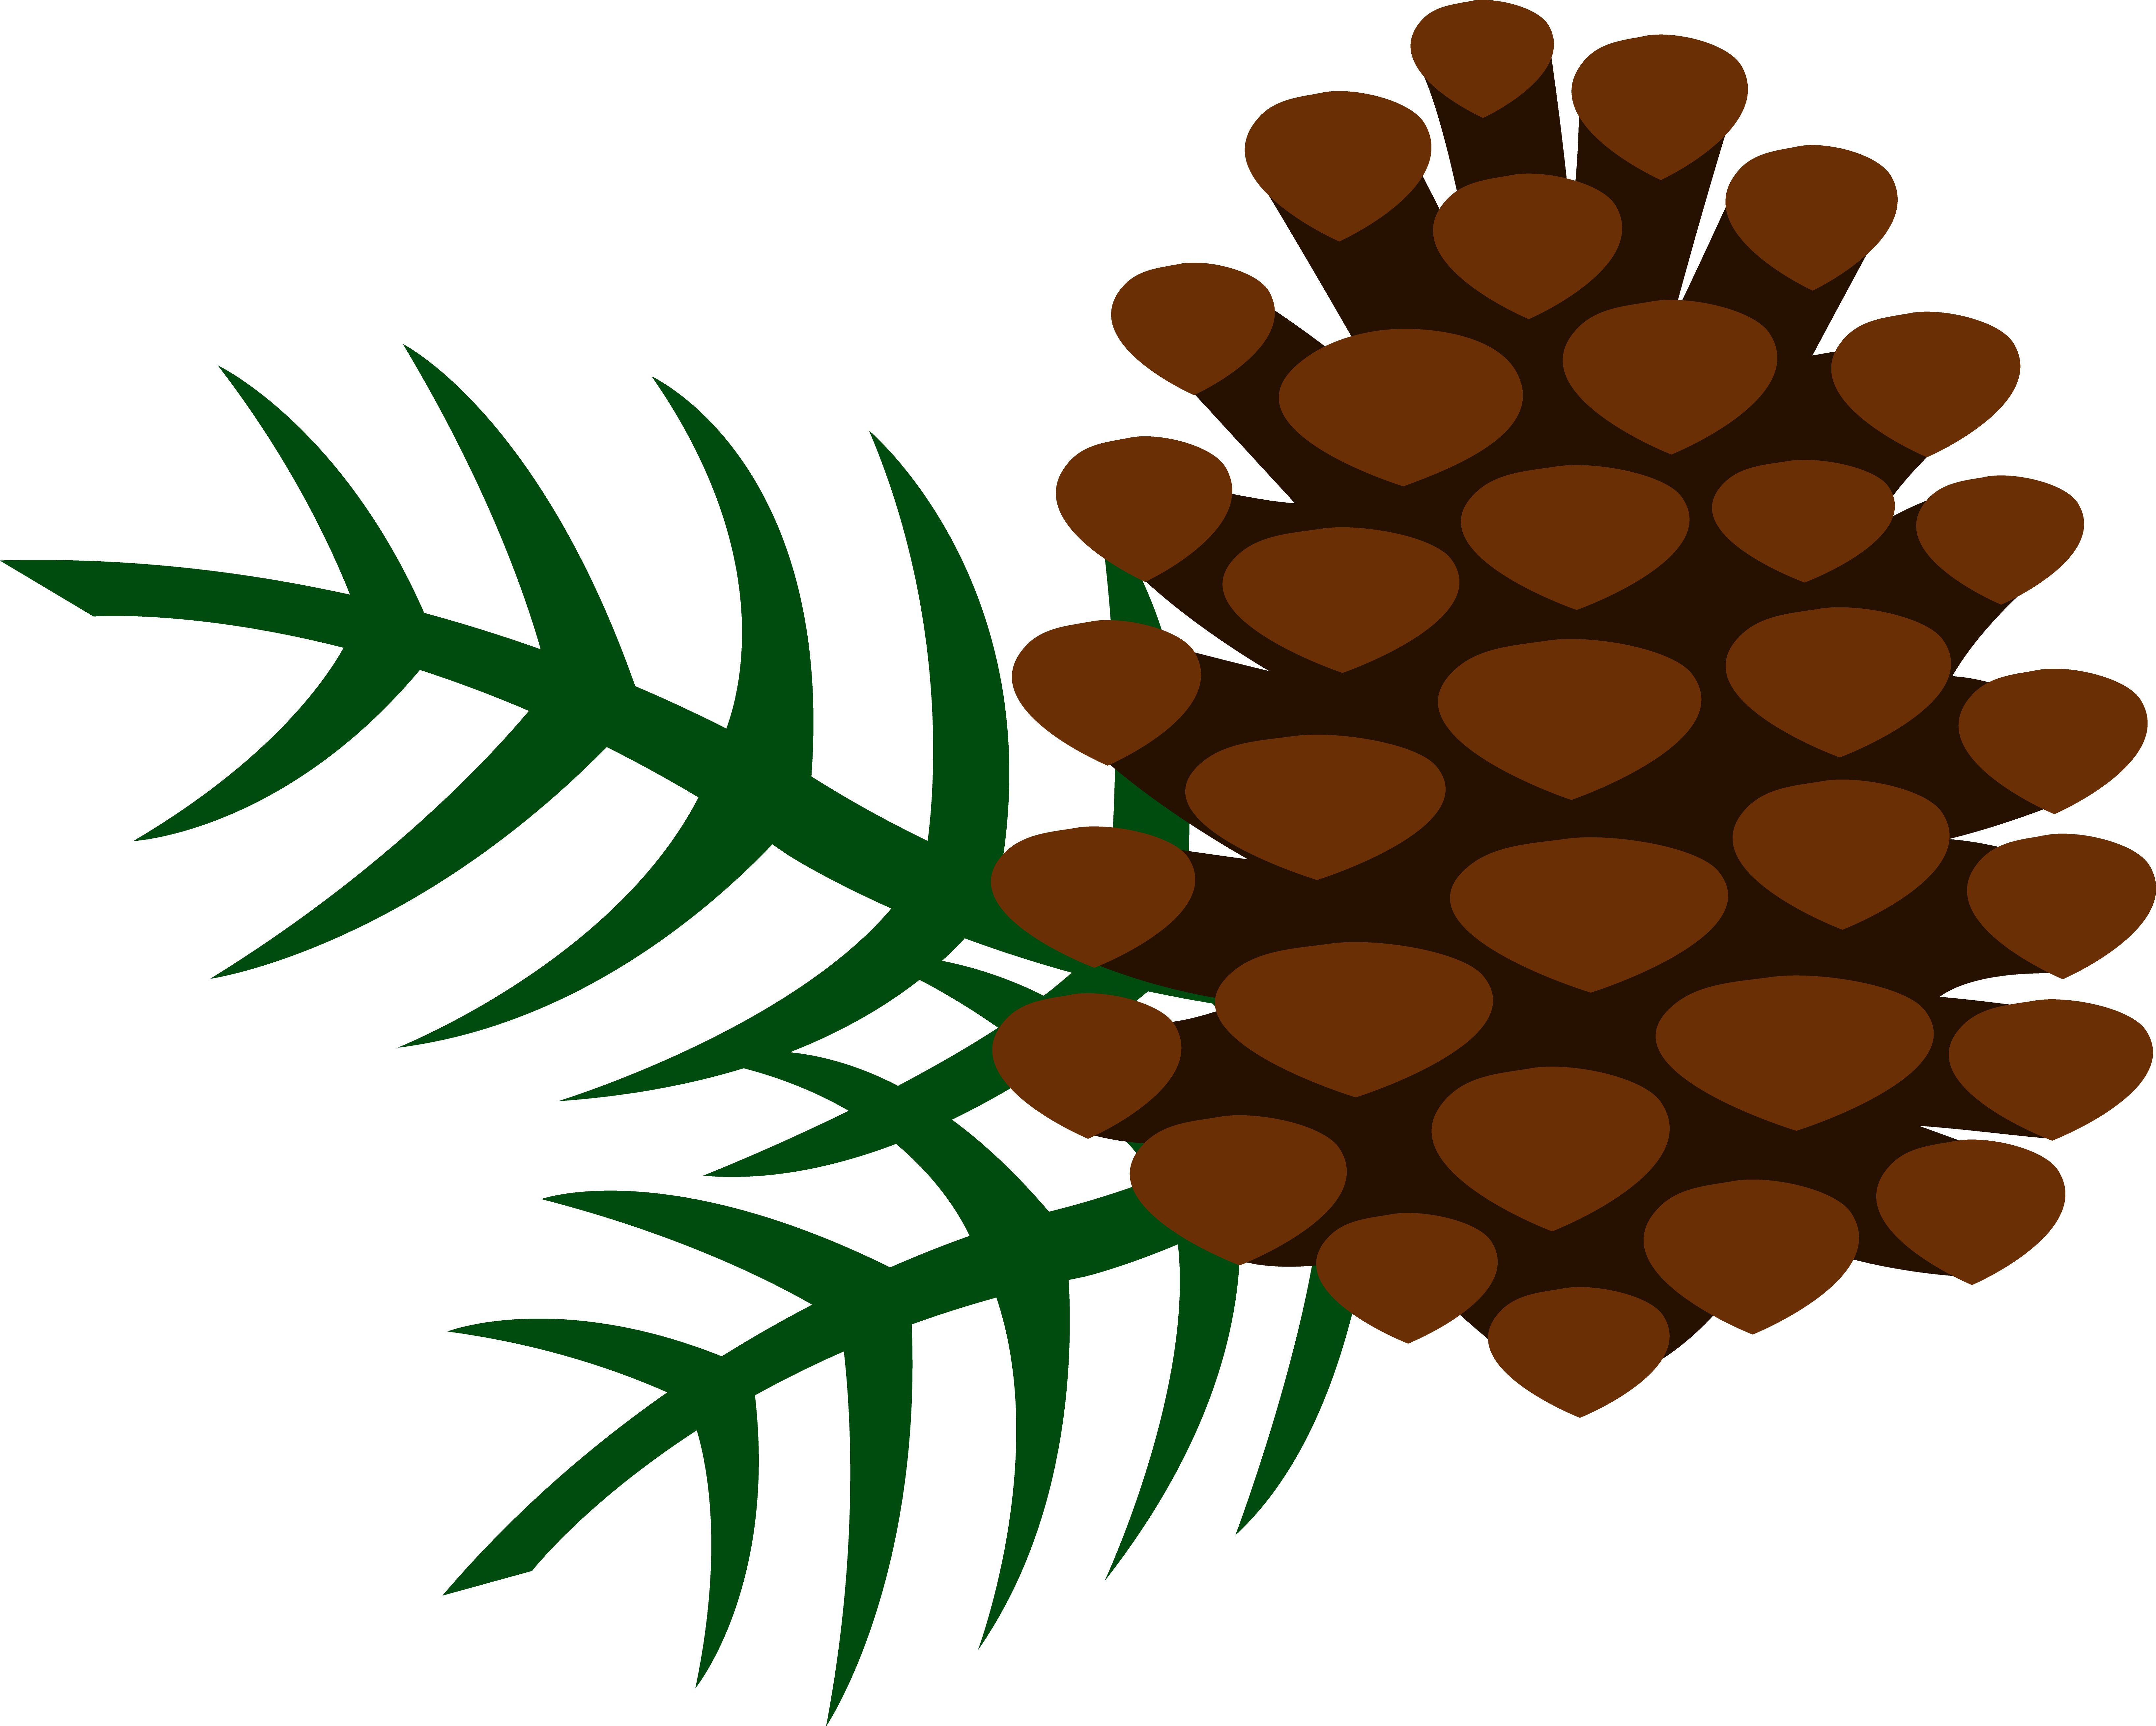 pine cones | Pine Cone and Pine Needles - Free Clip Art | Pine ...